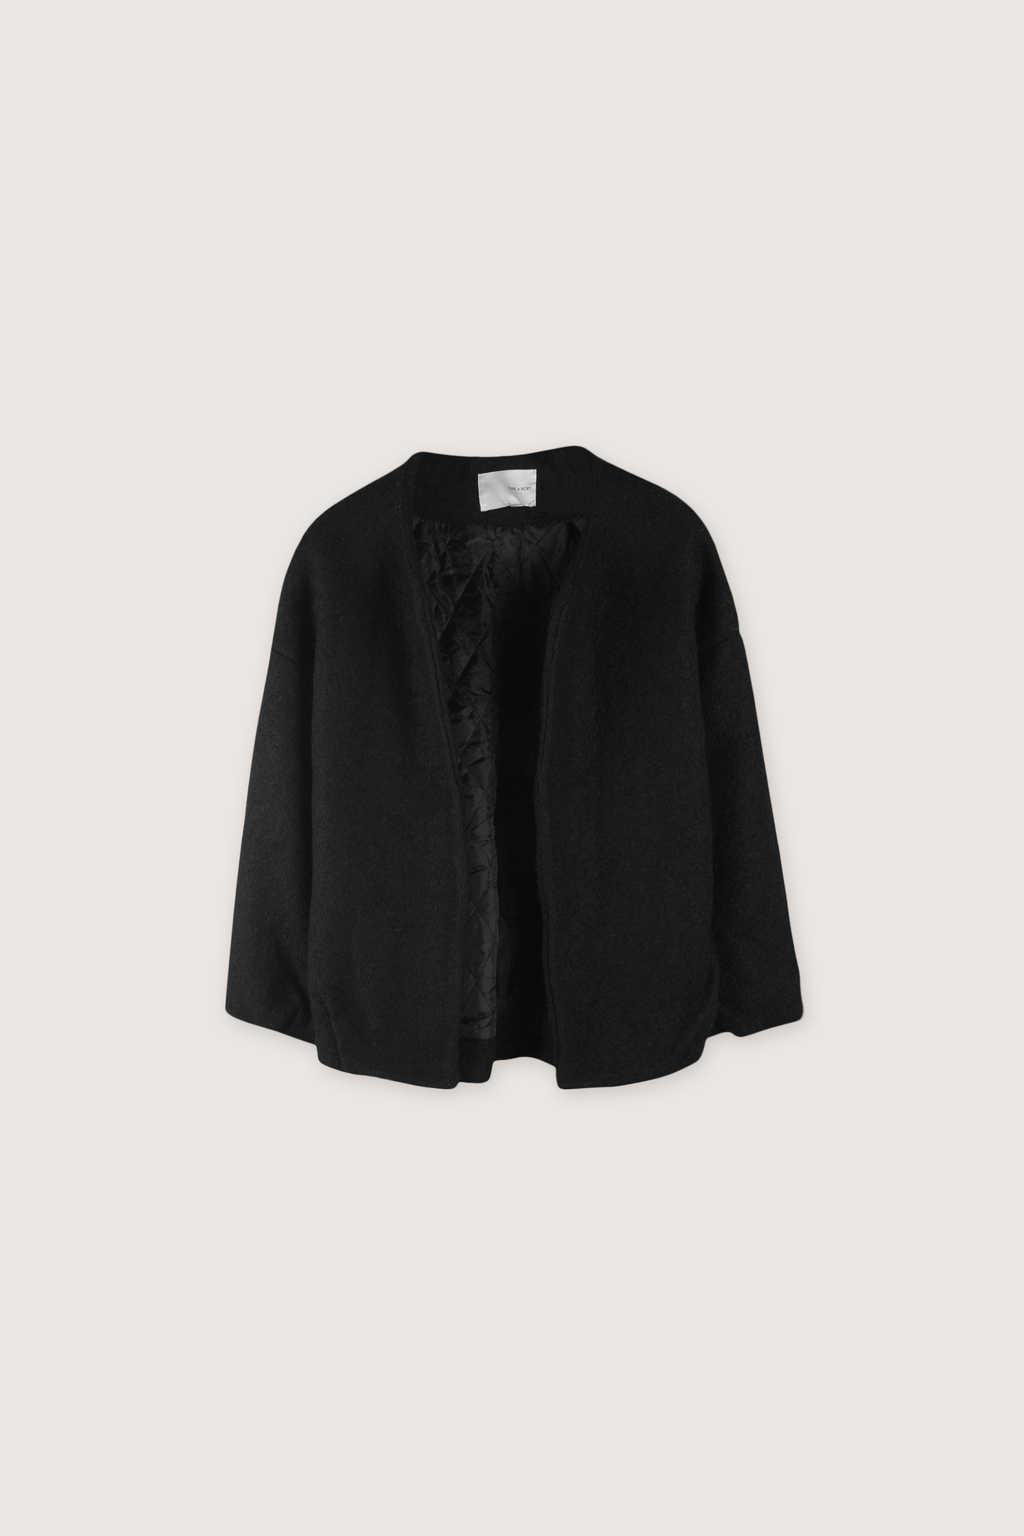 Jacket H177 Black 7